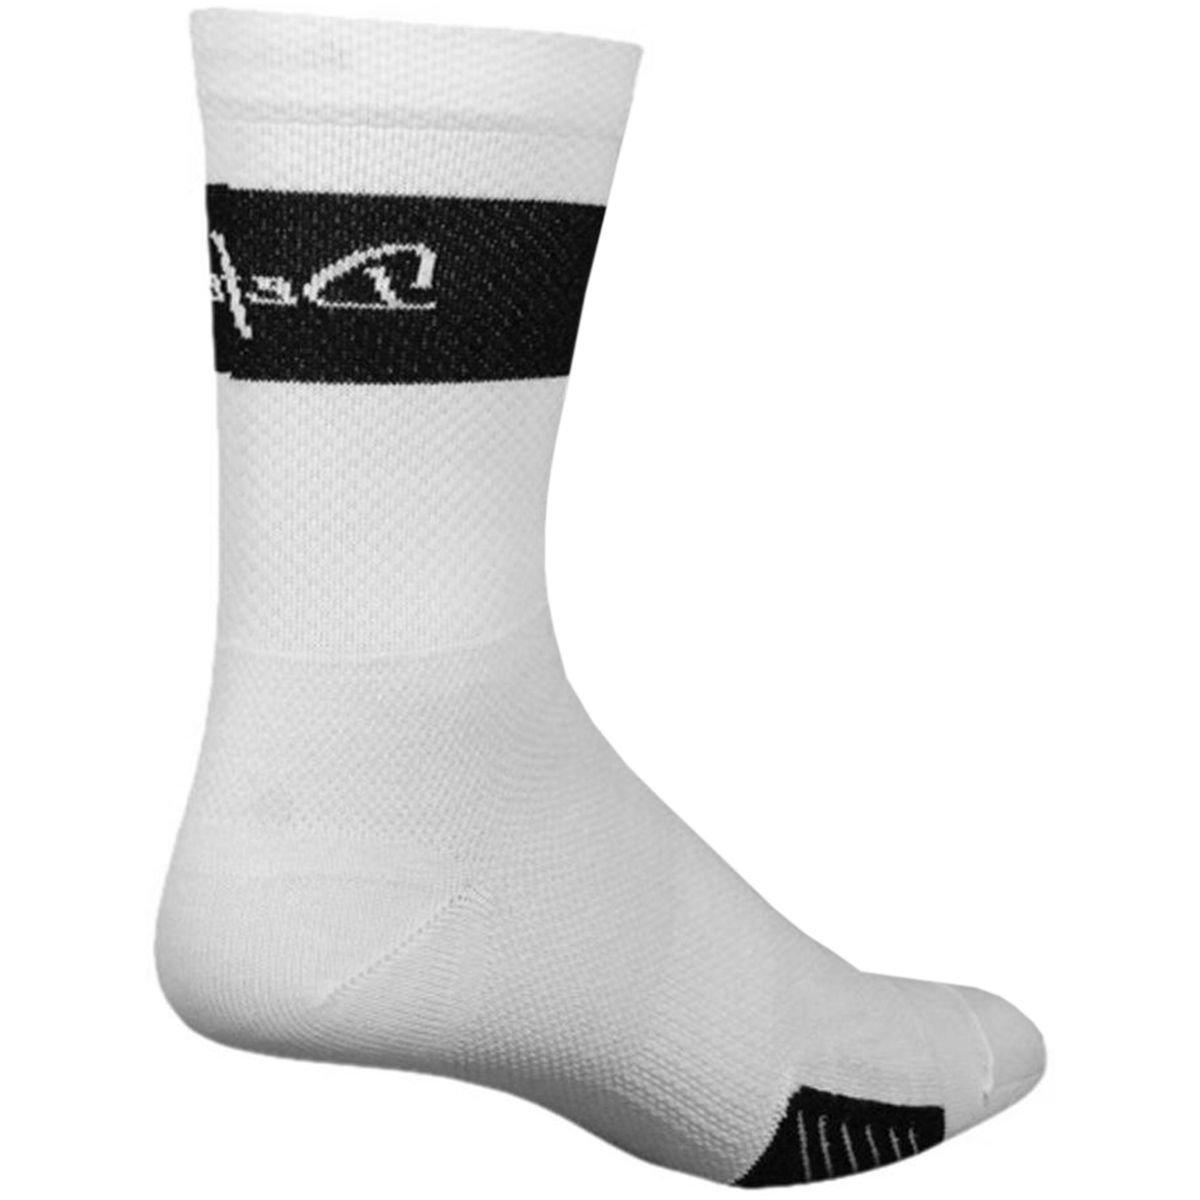 DeFeet International Cyclismo 5-Inch Trico Sock